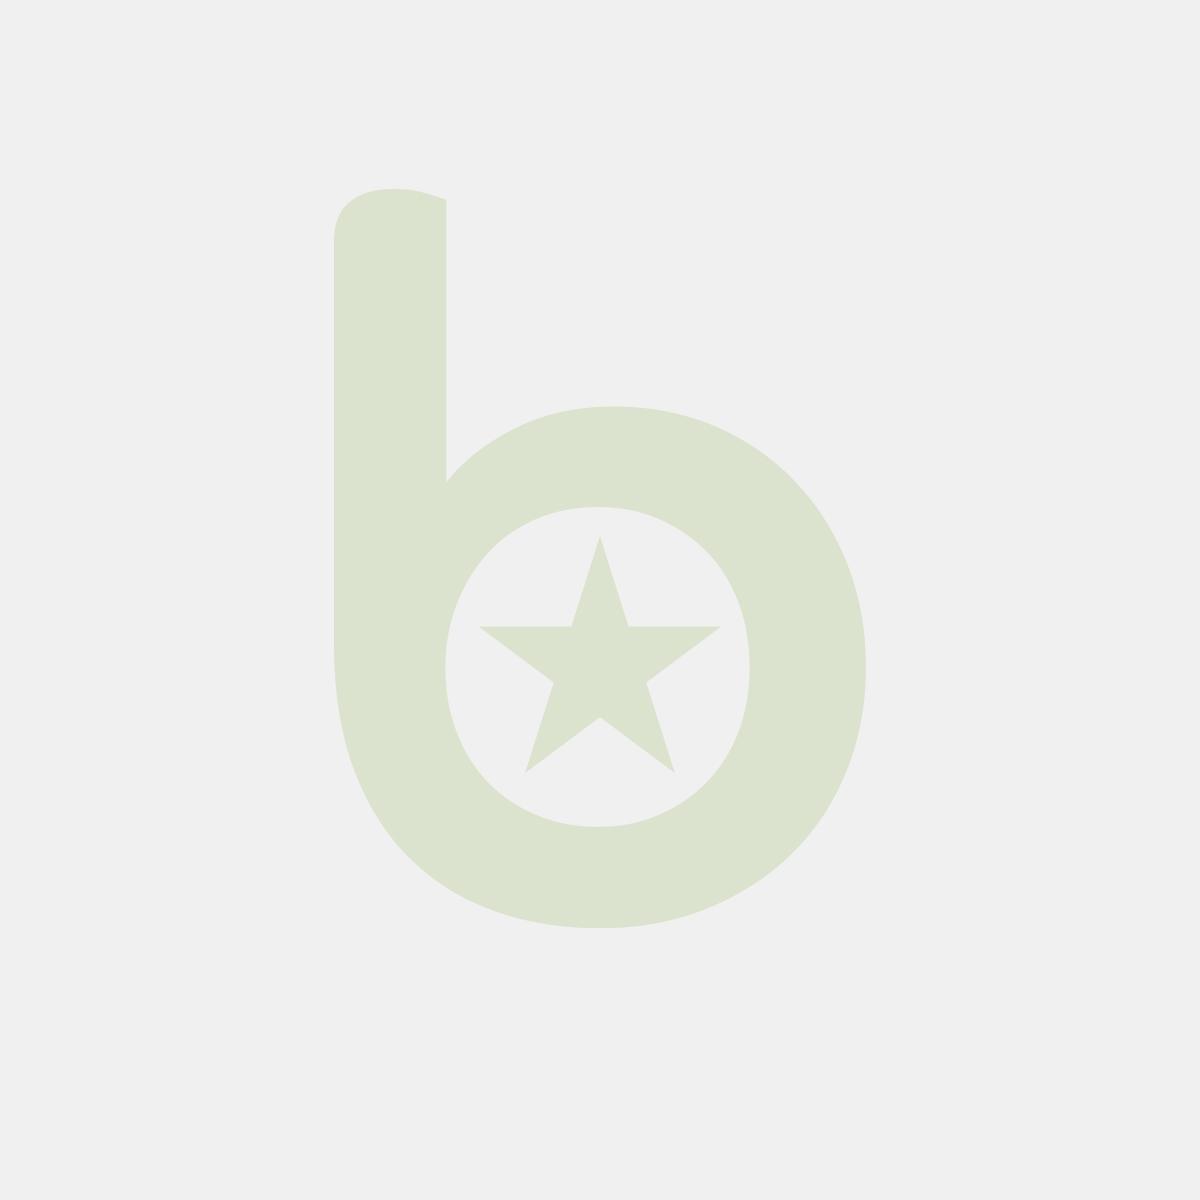 Cienkopis SCHNEIDER Line-Up Touch, 0,4mm, czarny